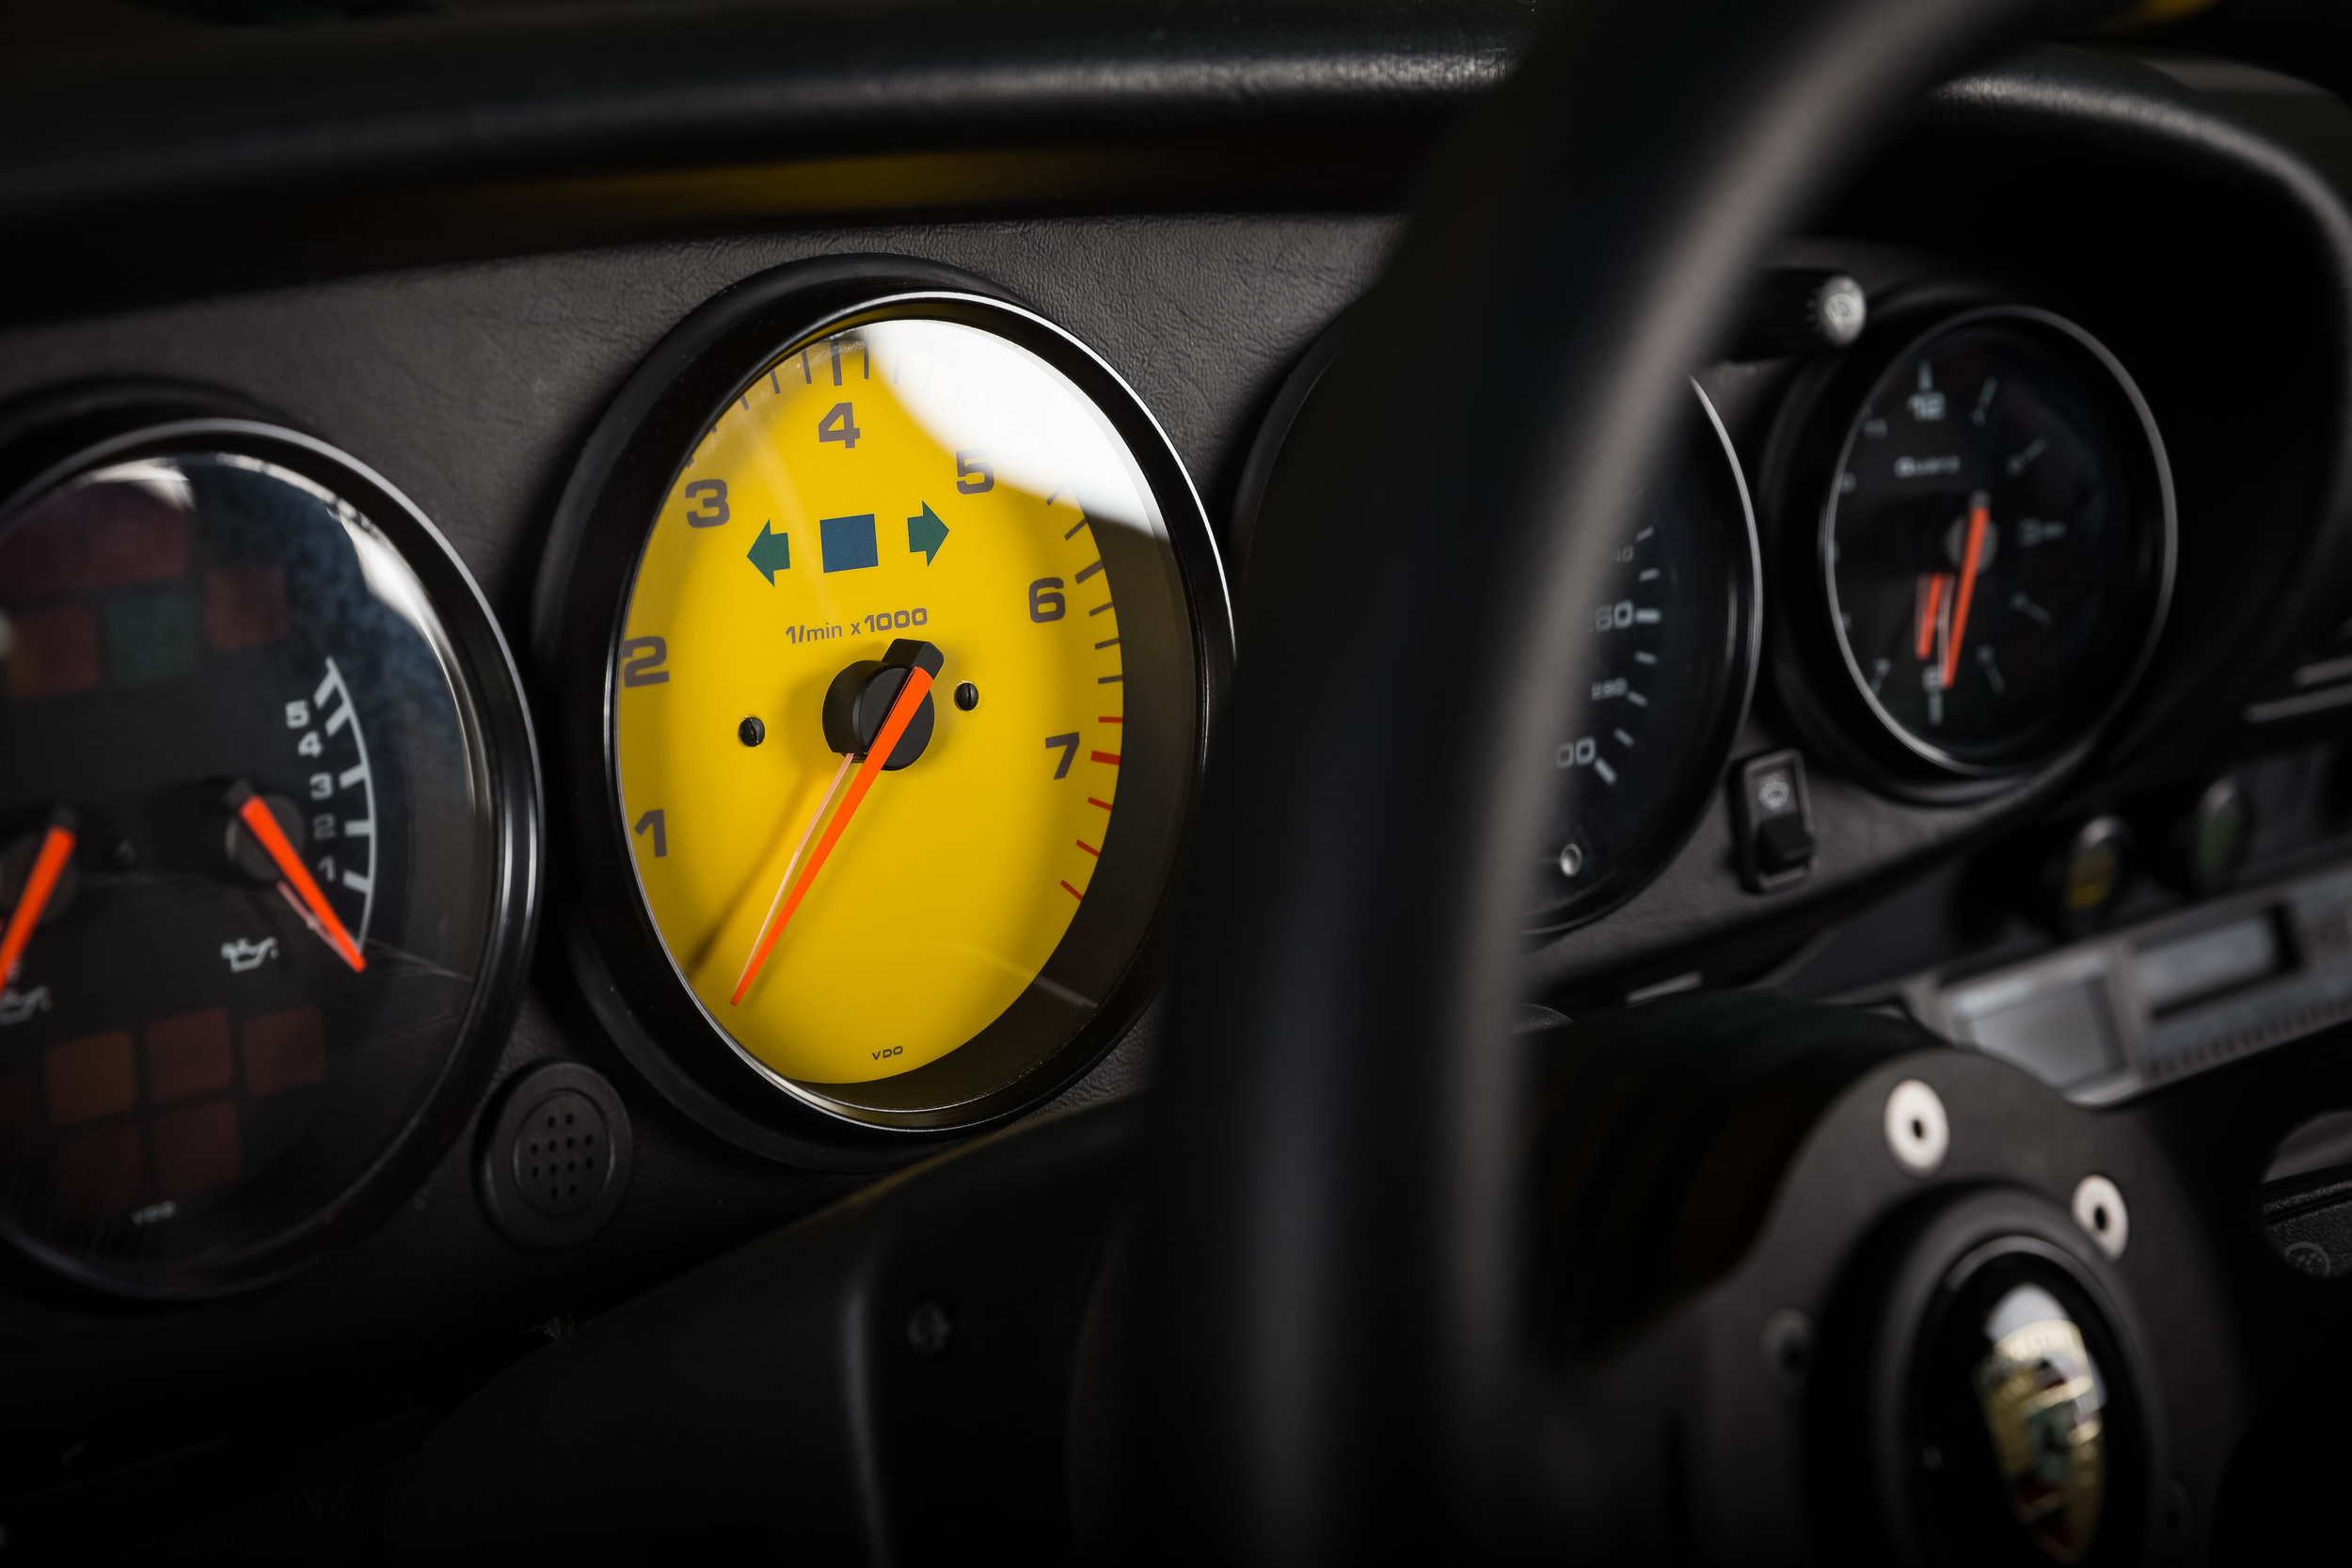 RWB Porsche Toronto n01_Lenssen-84.jpg